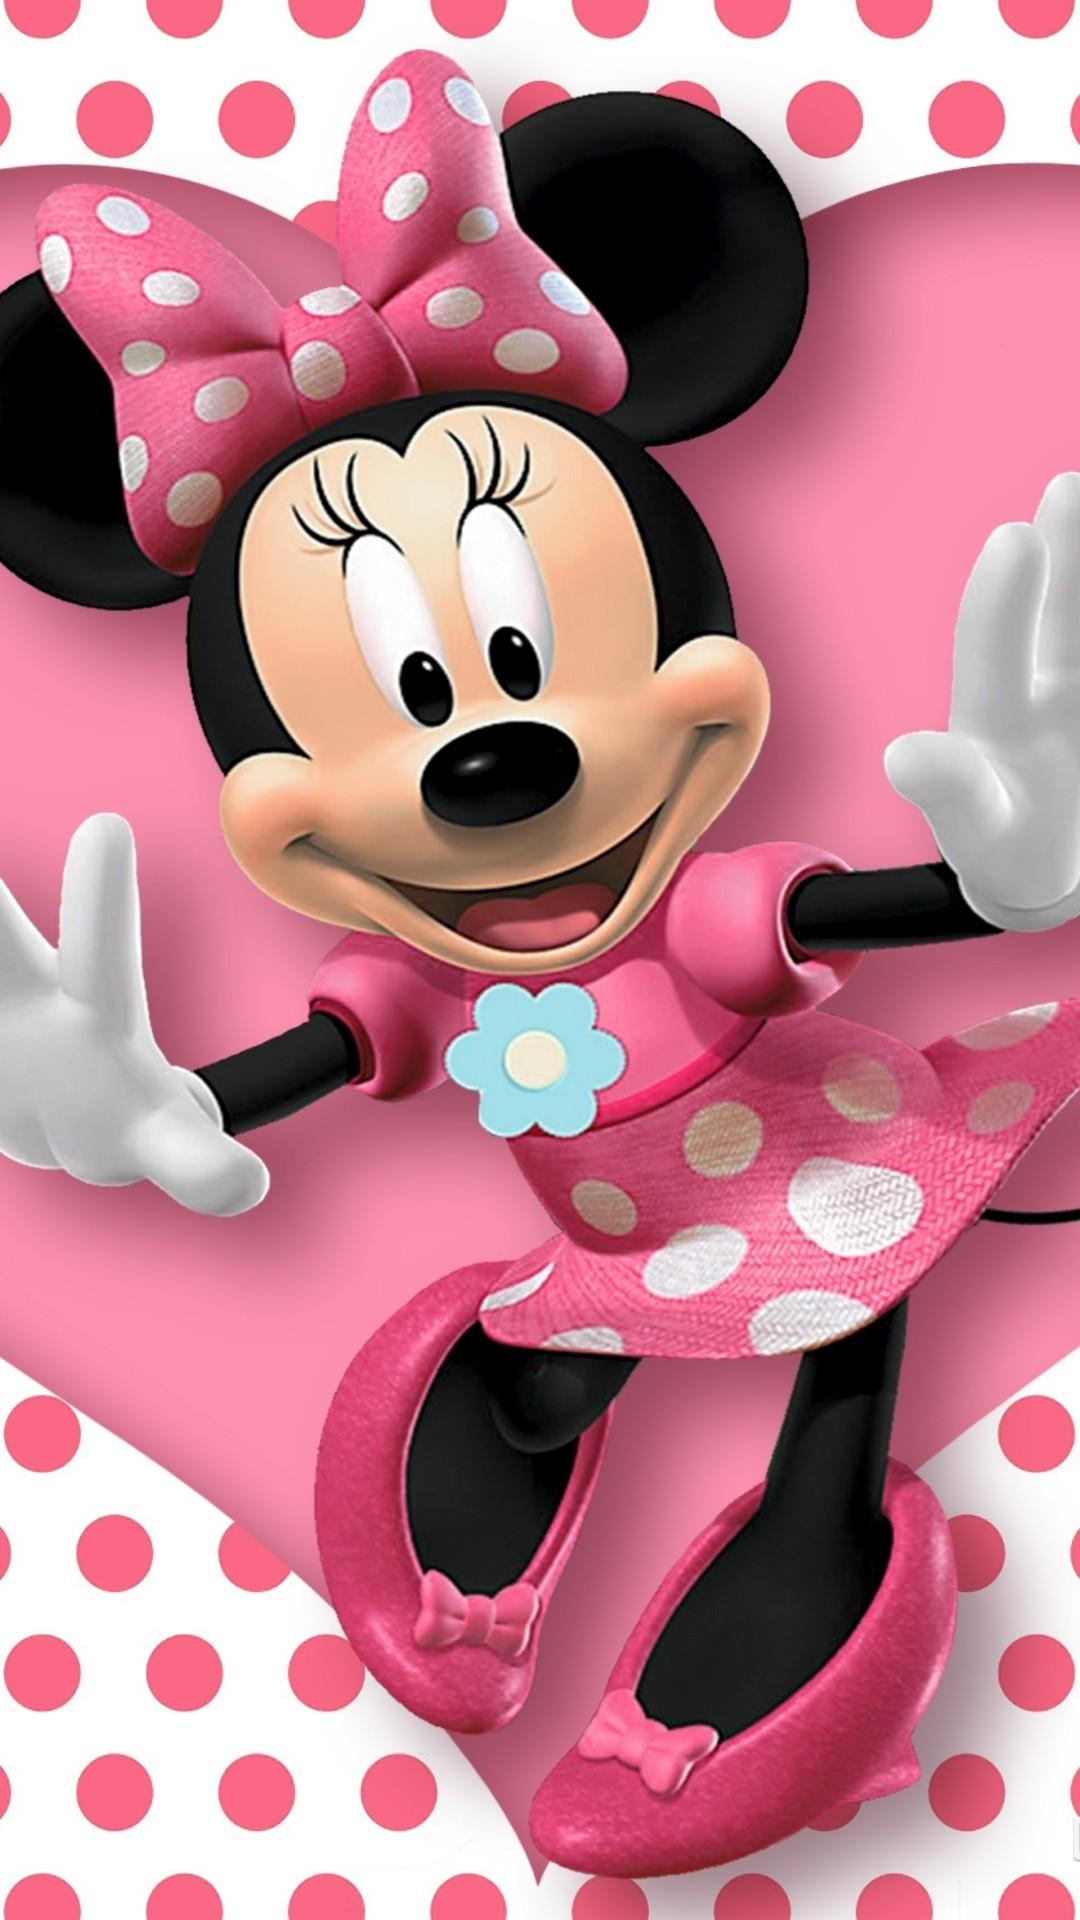 Disney iPhone 6 wallpaper